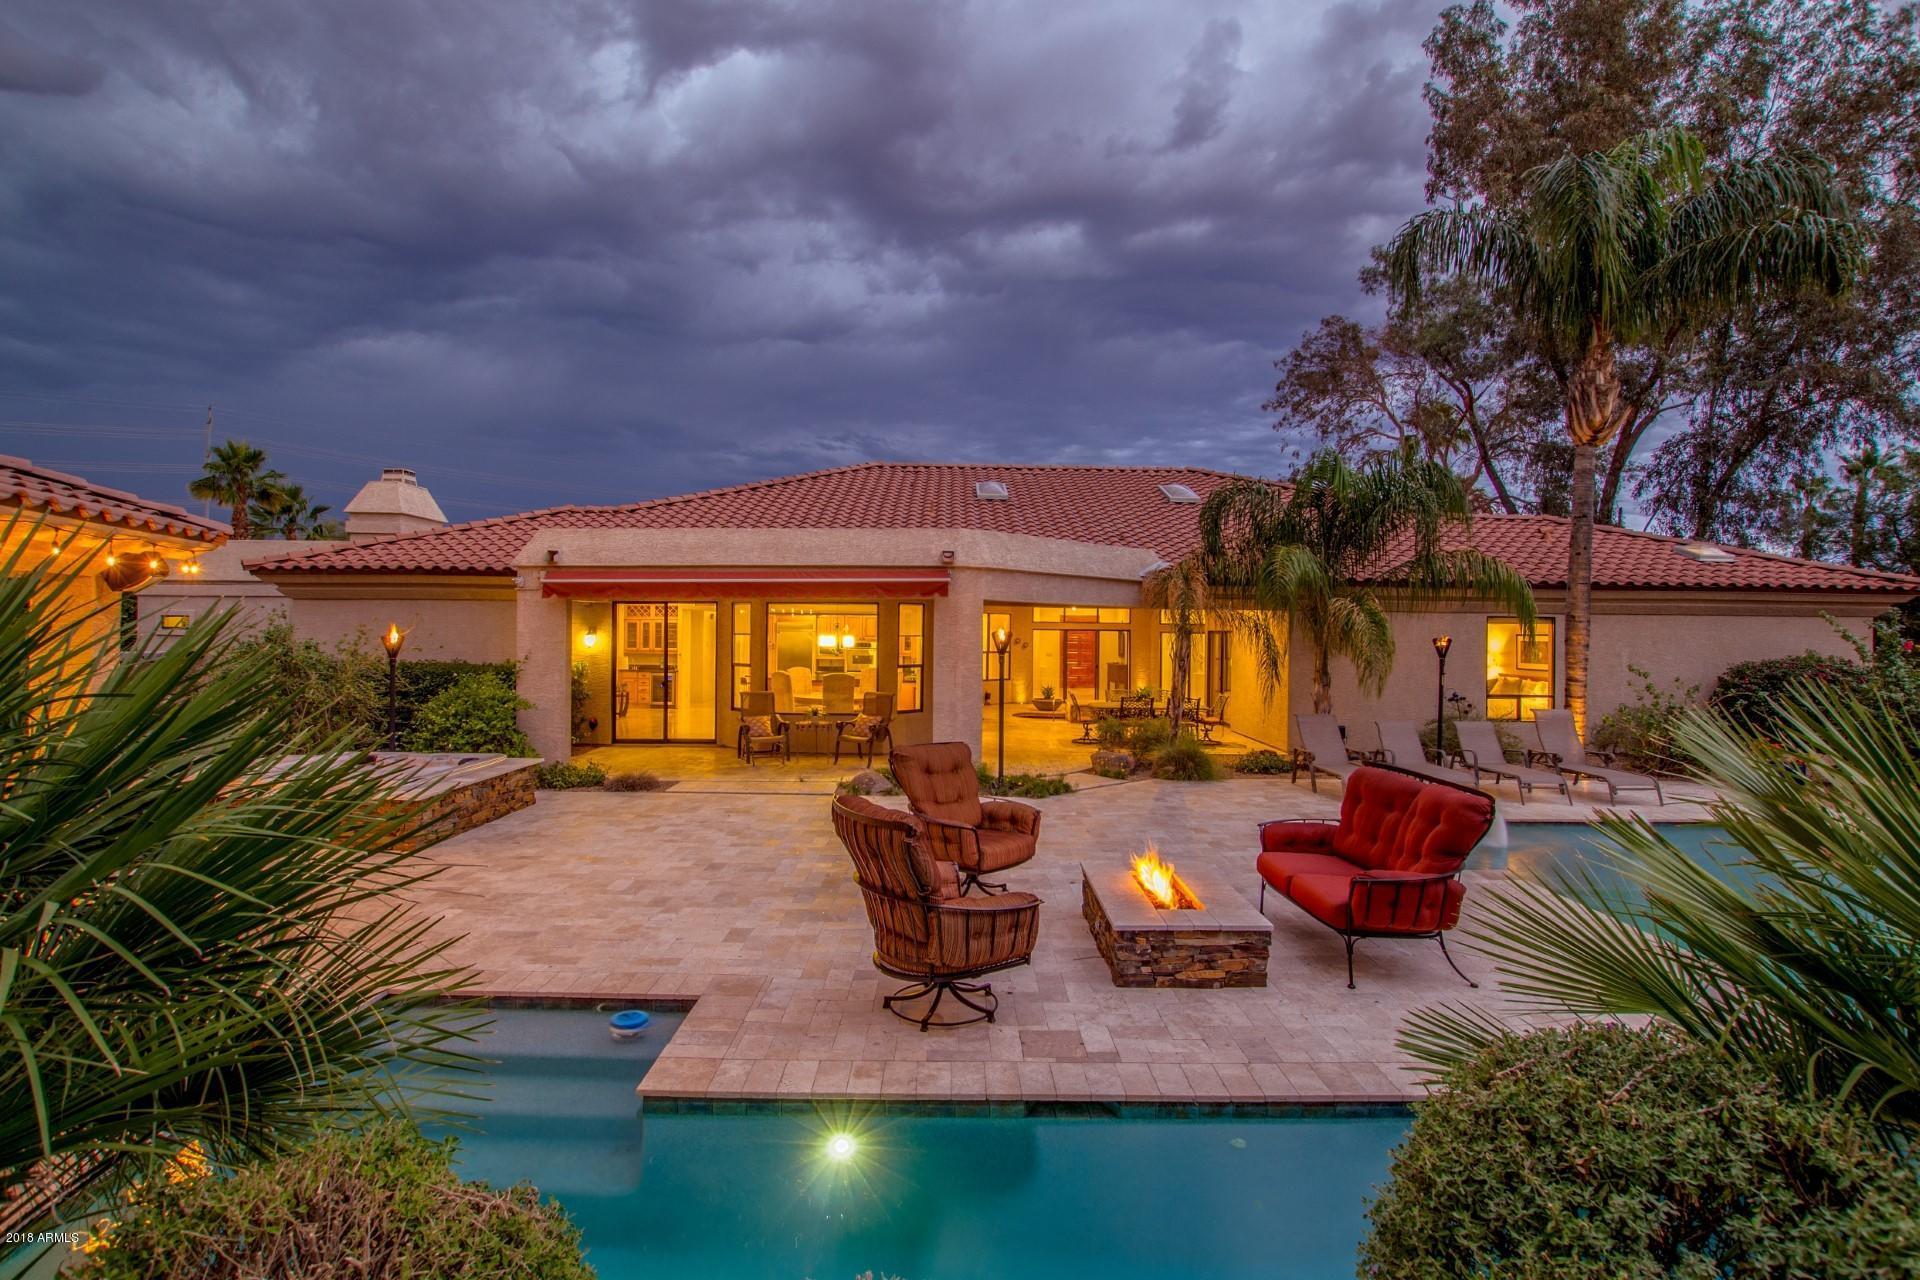 MLS 5837518 10569 N 106TH Place, Scottsdale, AZ 85258 Scottsdale AZ Scottsdale Ranch